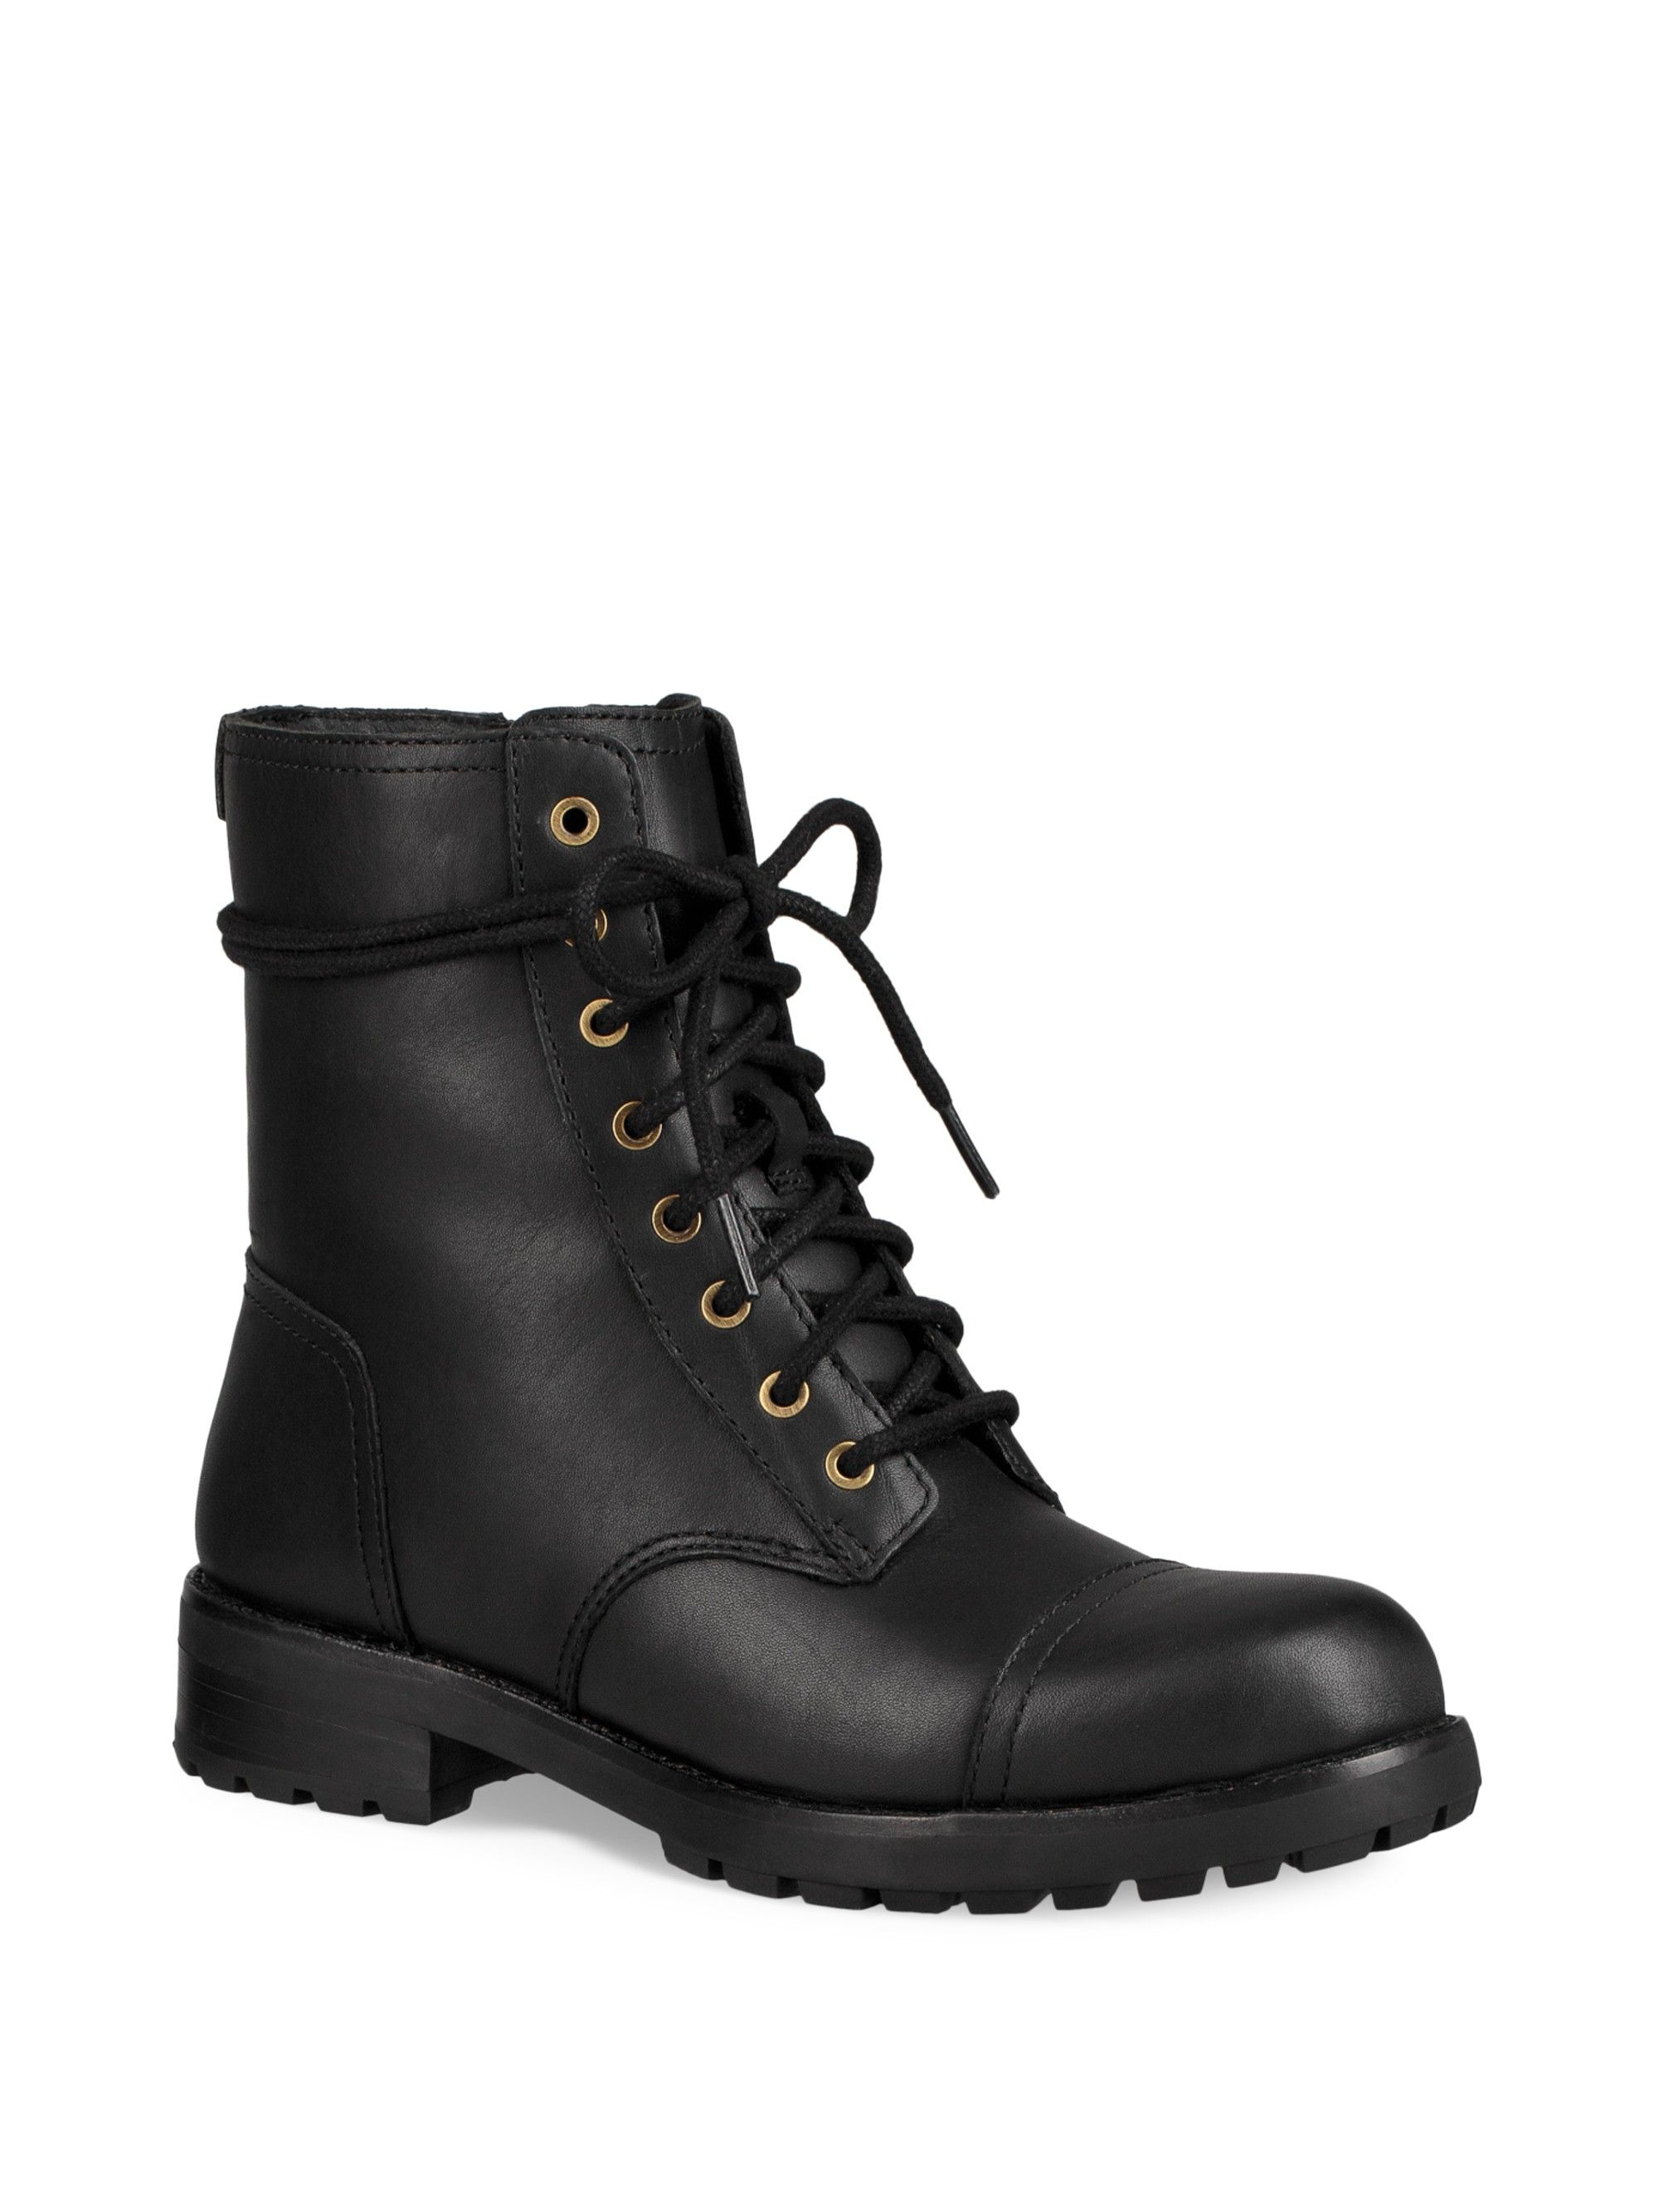 e55e125bcfc Ugg Australia Kilmer Lace-Up Leather Booties - Black 7.5 | Products ...